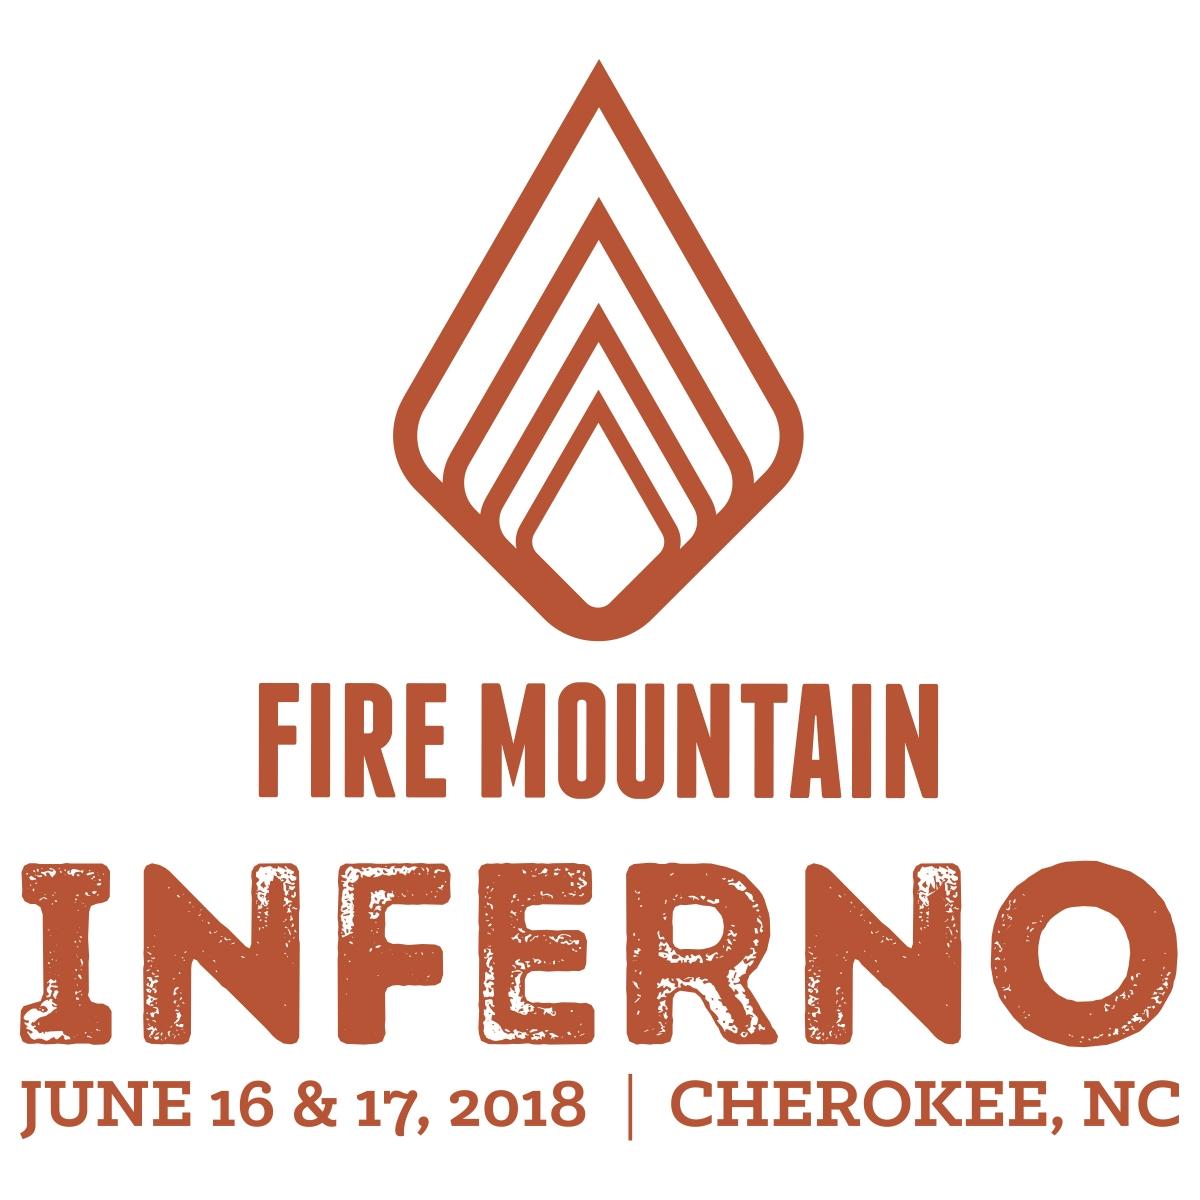 Fire Mountain Inferno Enduro